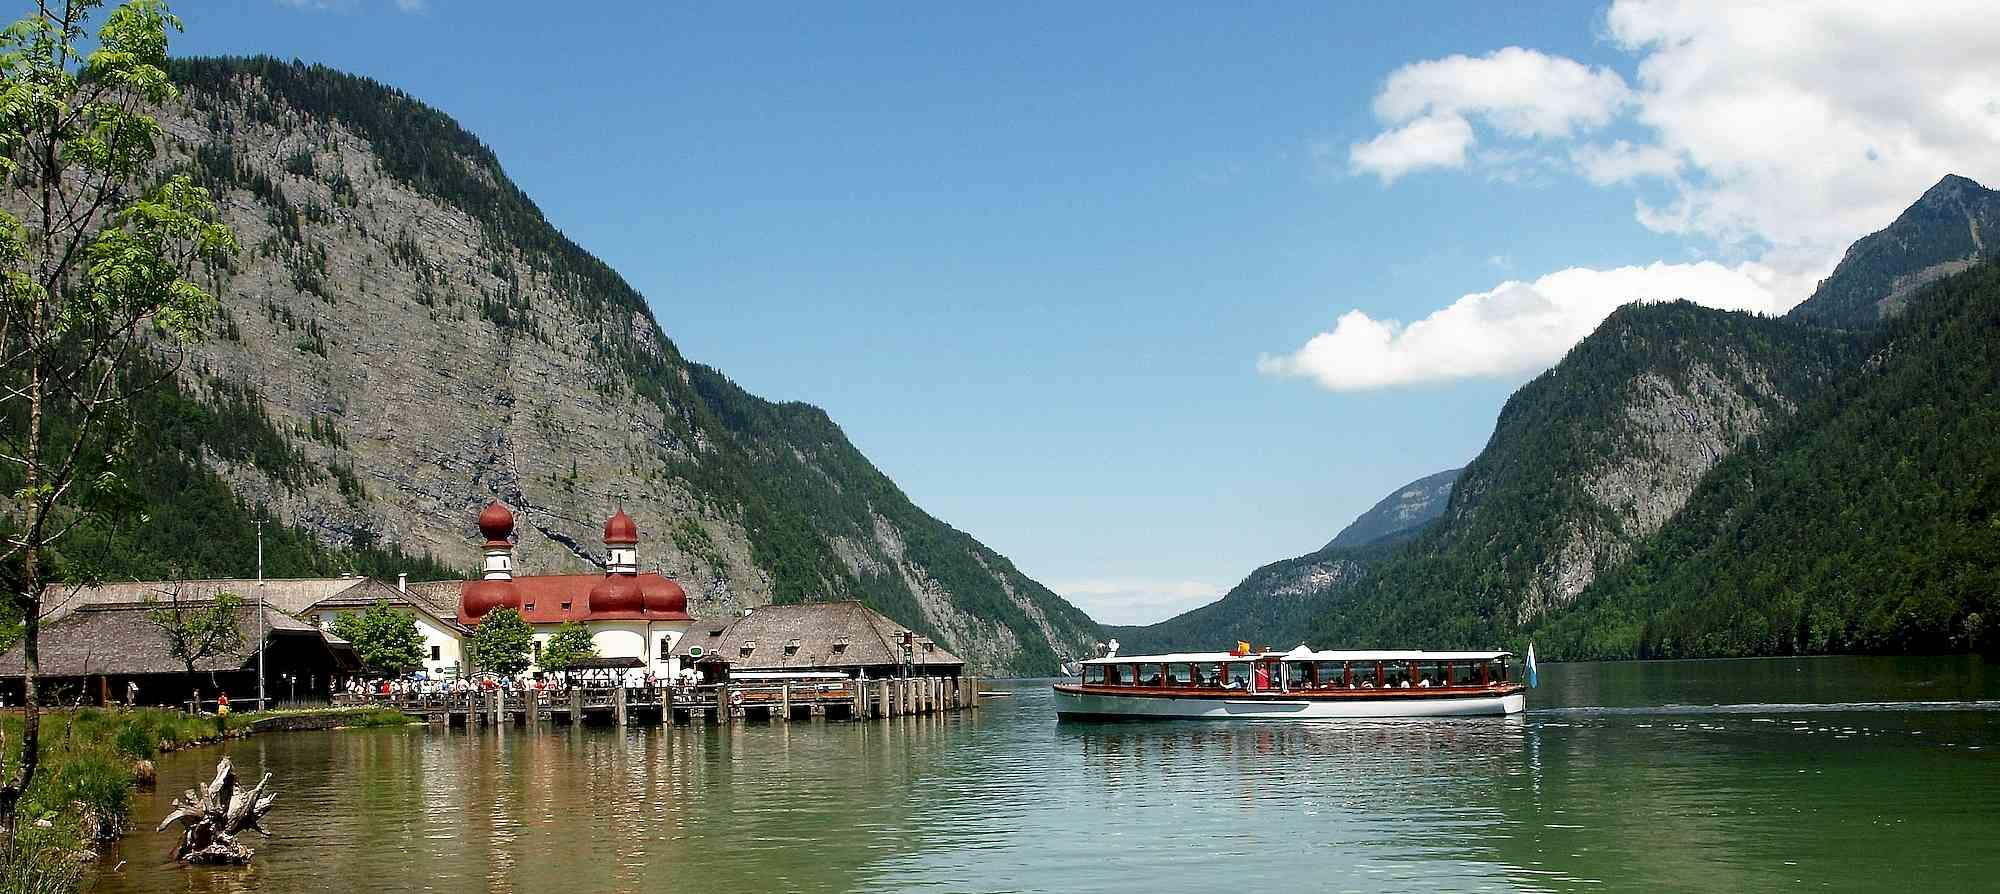 Beliebte Ausflugsziele in Berchtesgaden